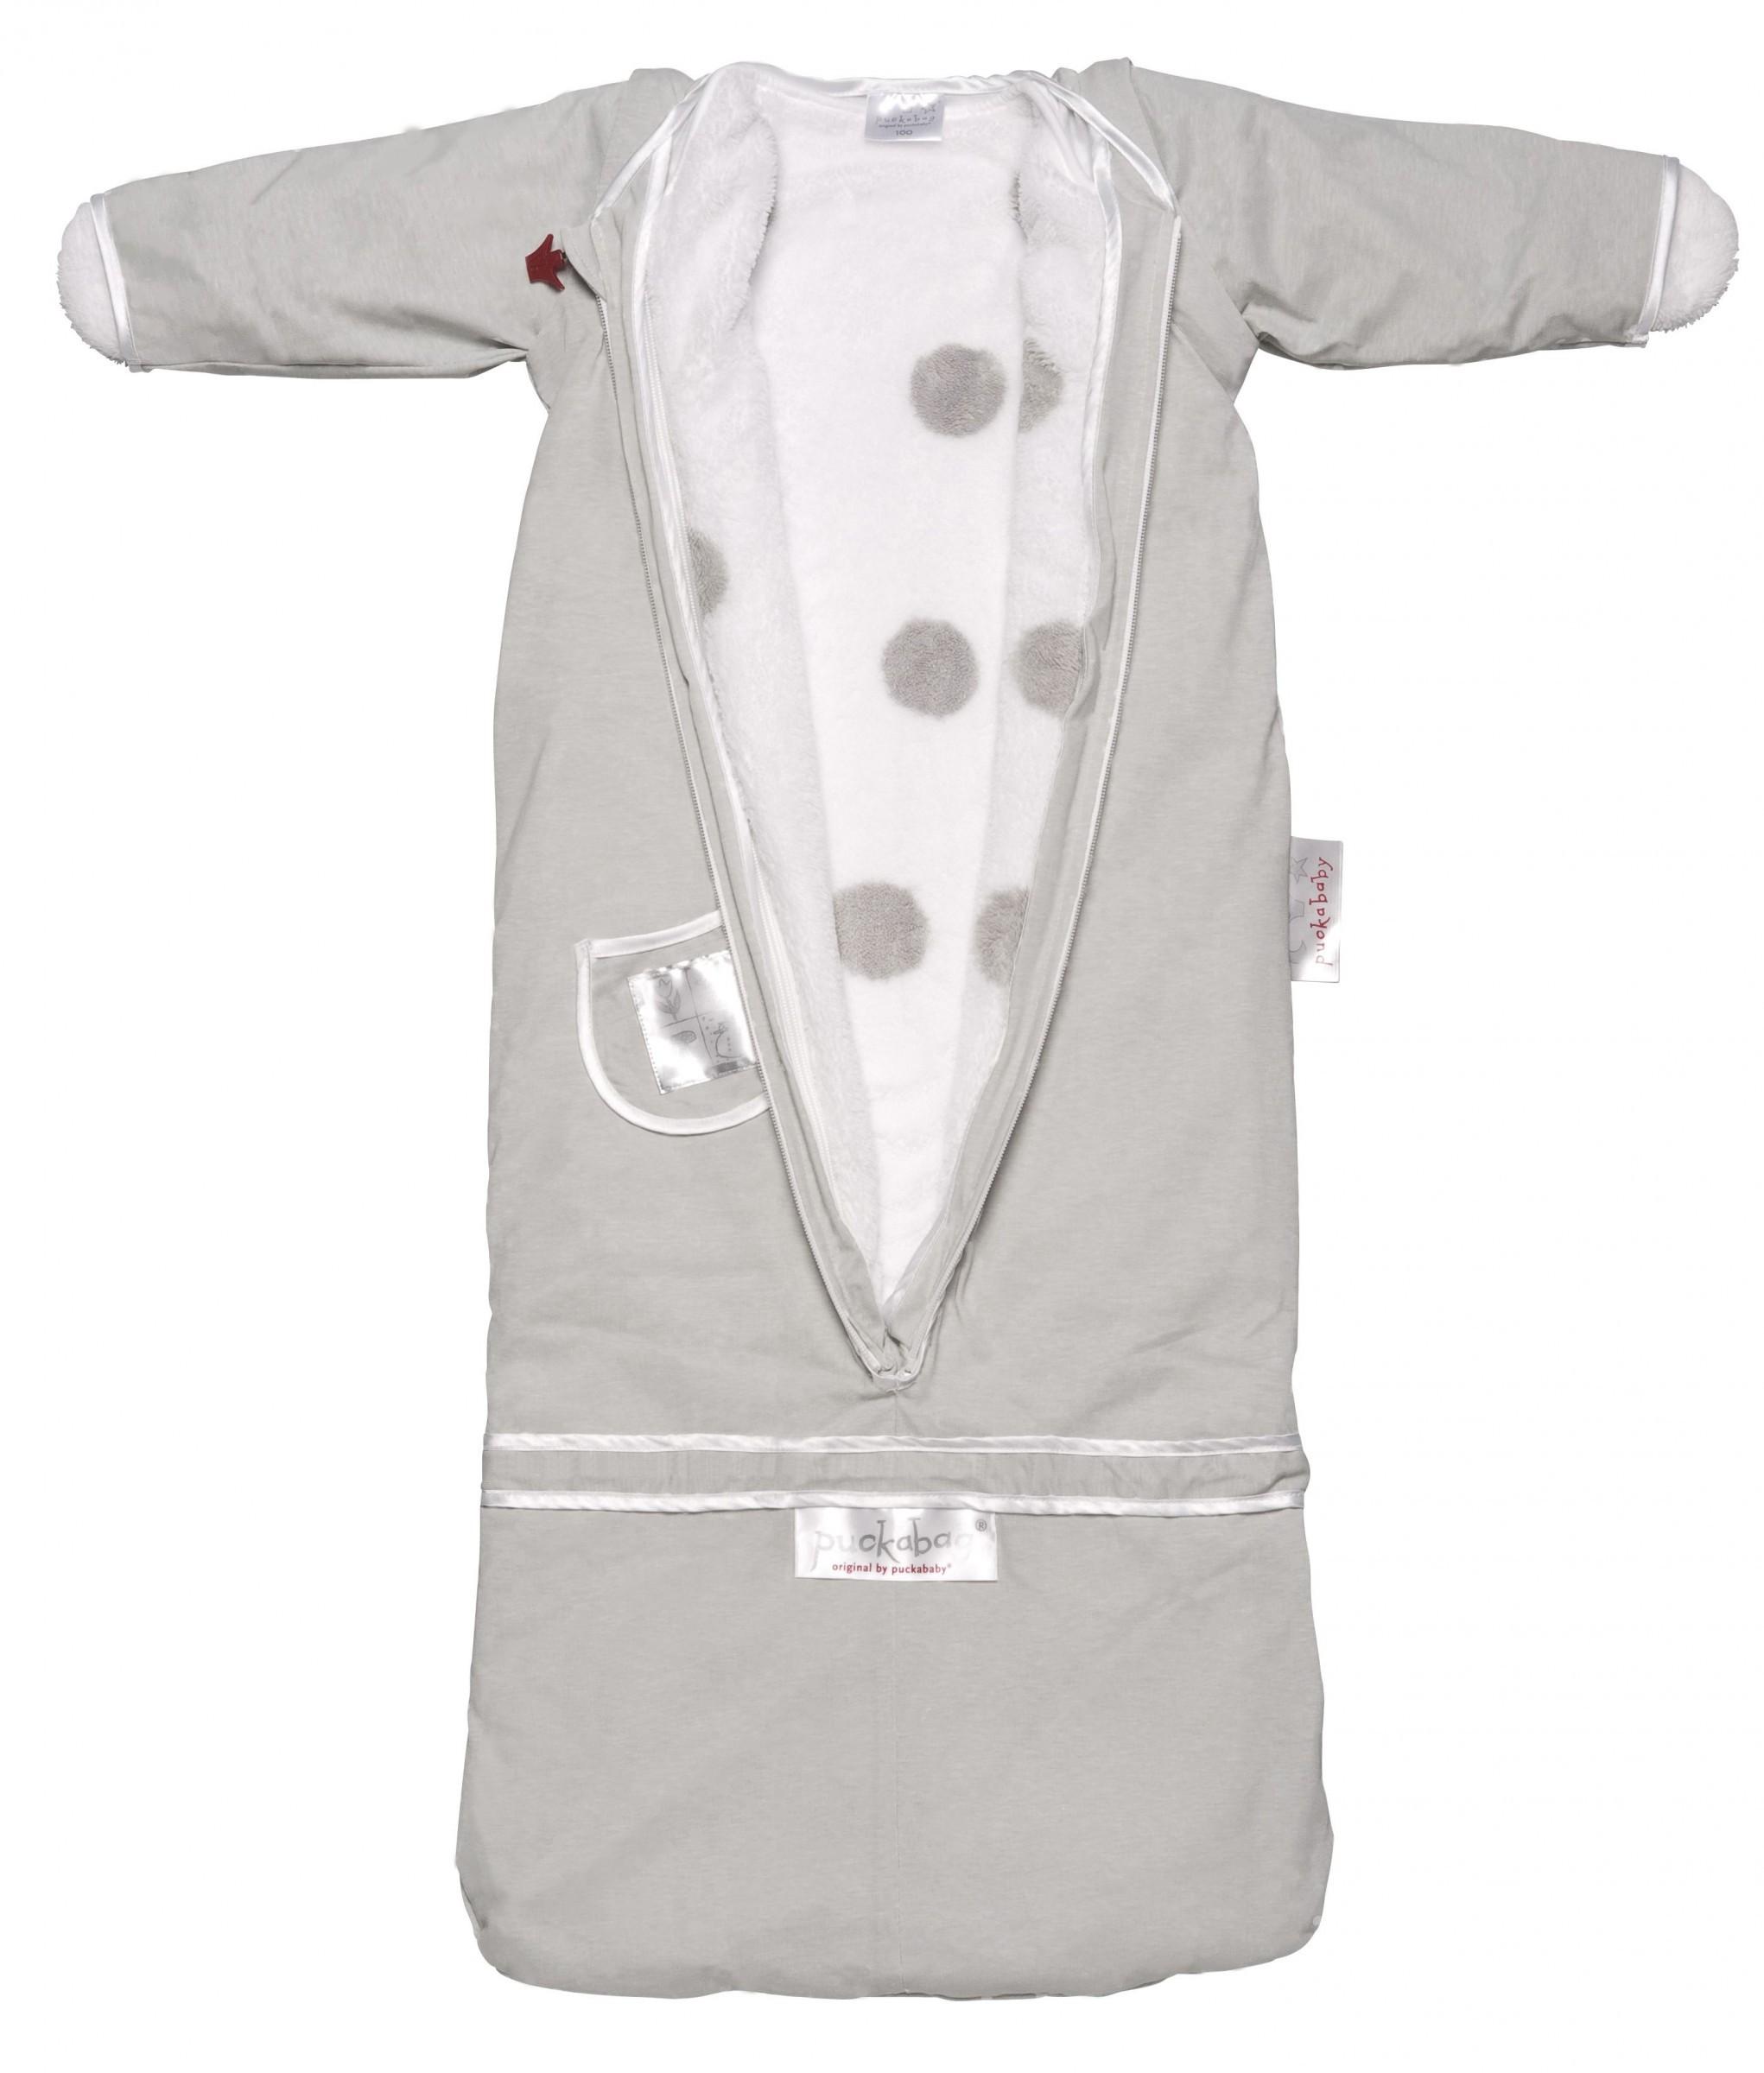 Puckababy Schlafsack The Bag 4-seasons grey uni/white